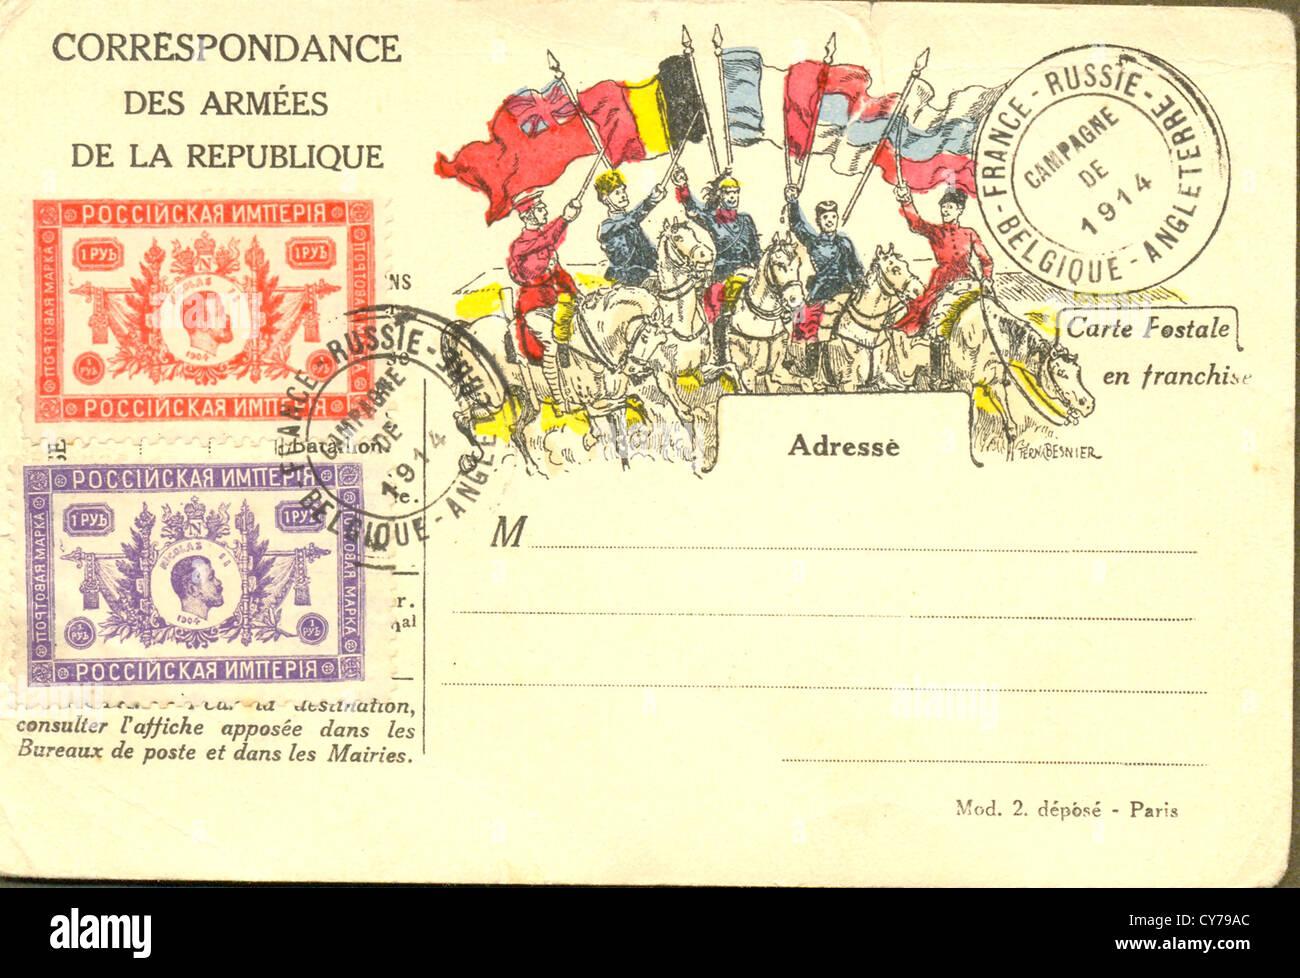 World War One postal stationery - Stock Image